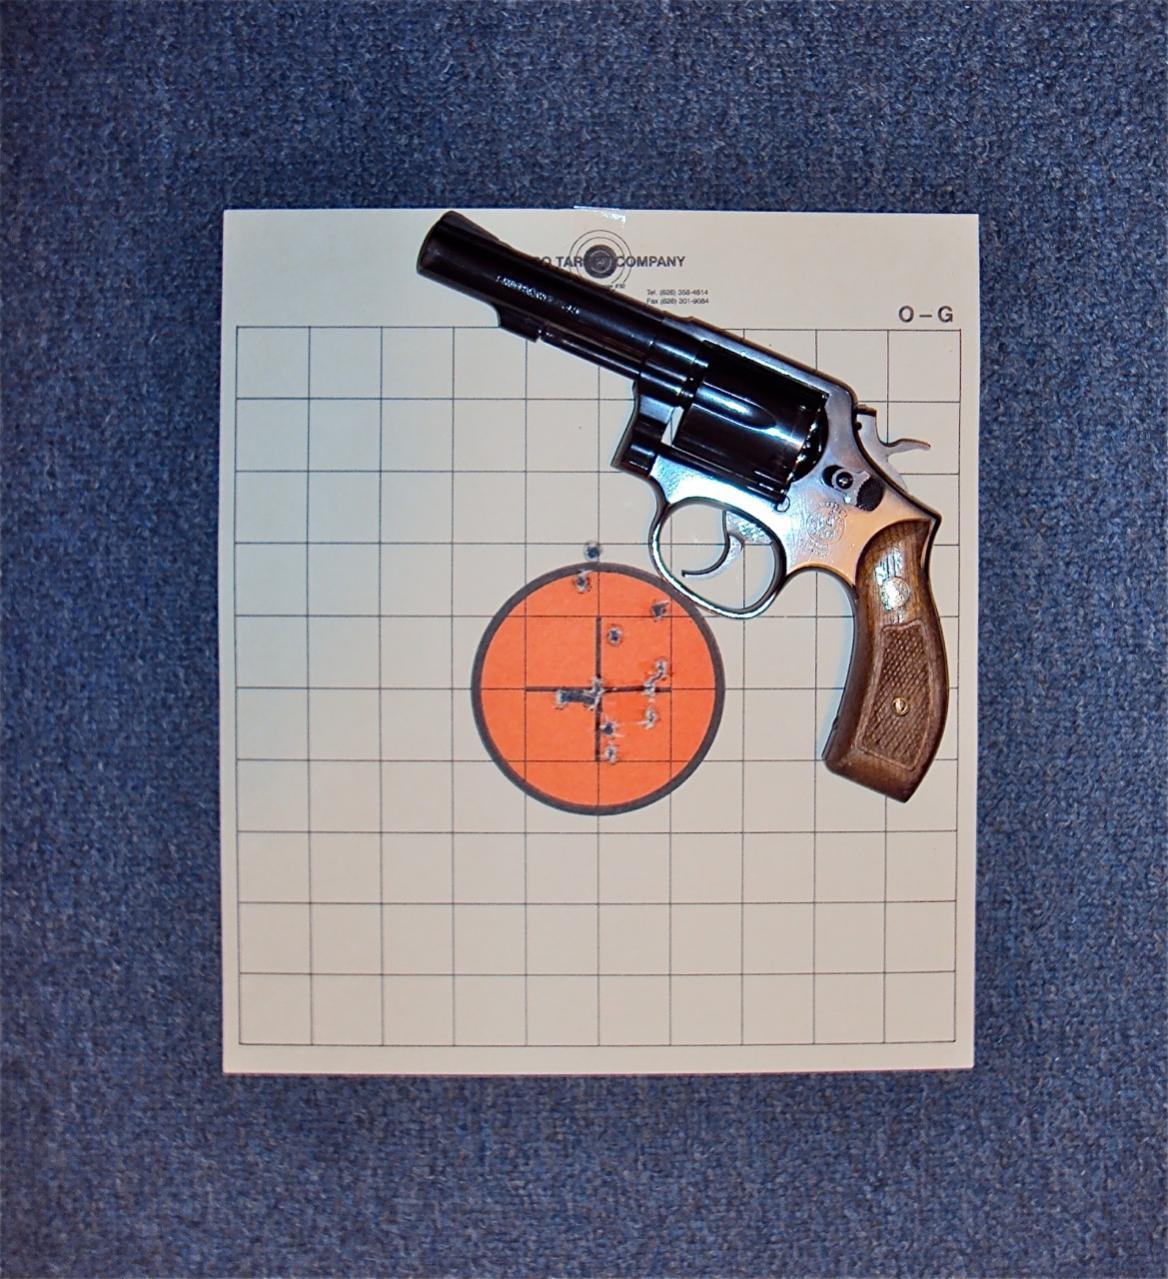 Got my Model 10 from Bud's!-s-w_target.jpg